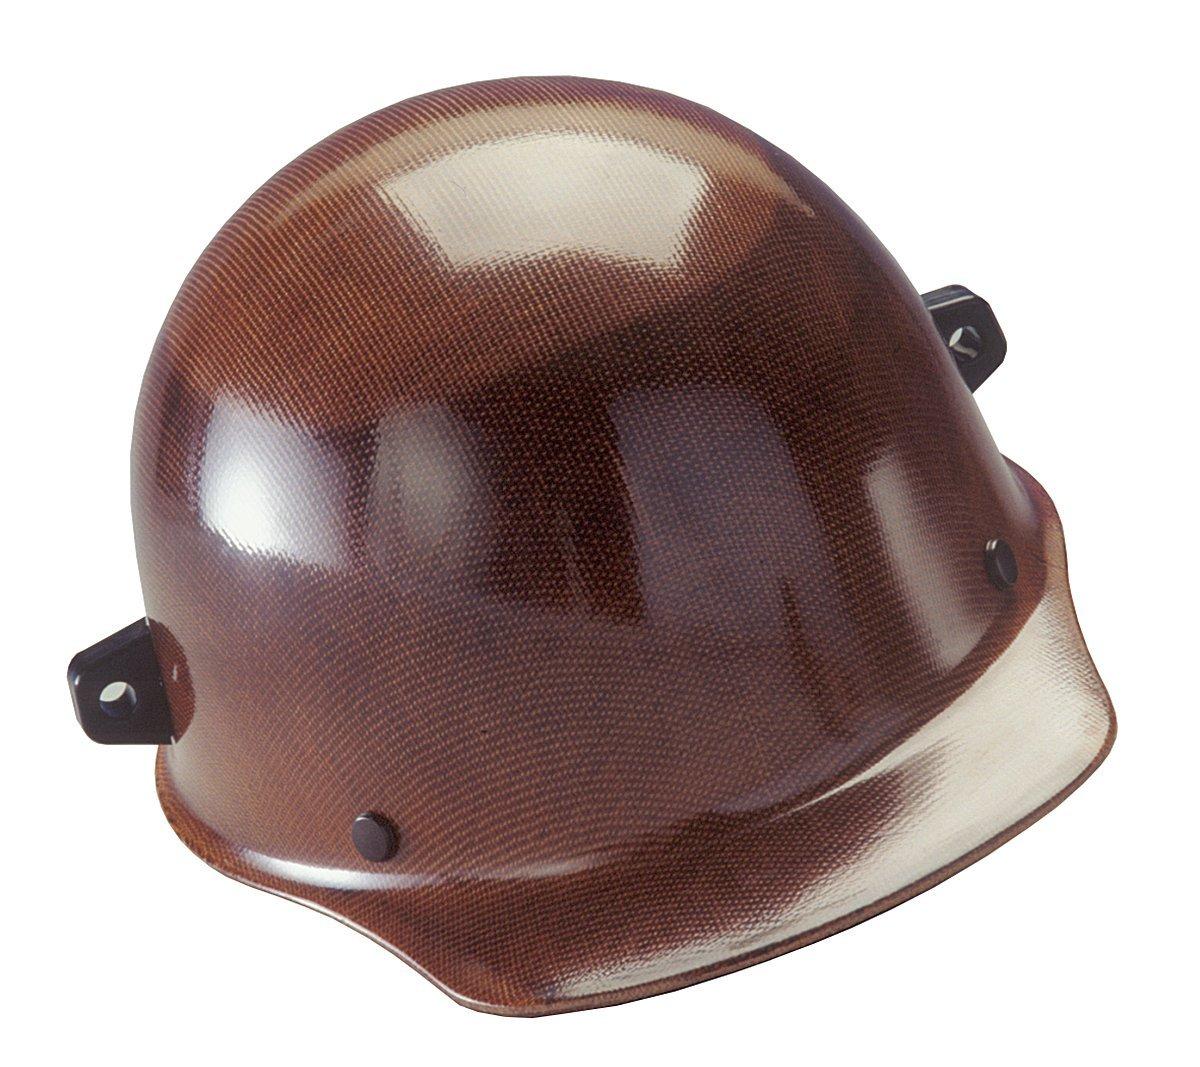 MSA 482002 Skullgard Protective Hard Hat Front Brim, Fas-Trac III Suspension, Standard Size, Natural Tan